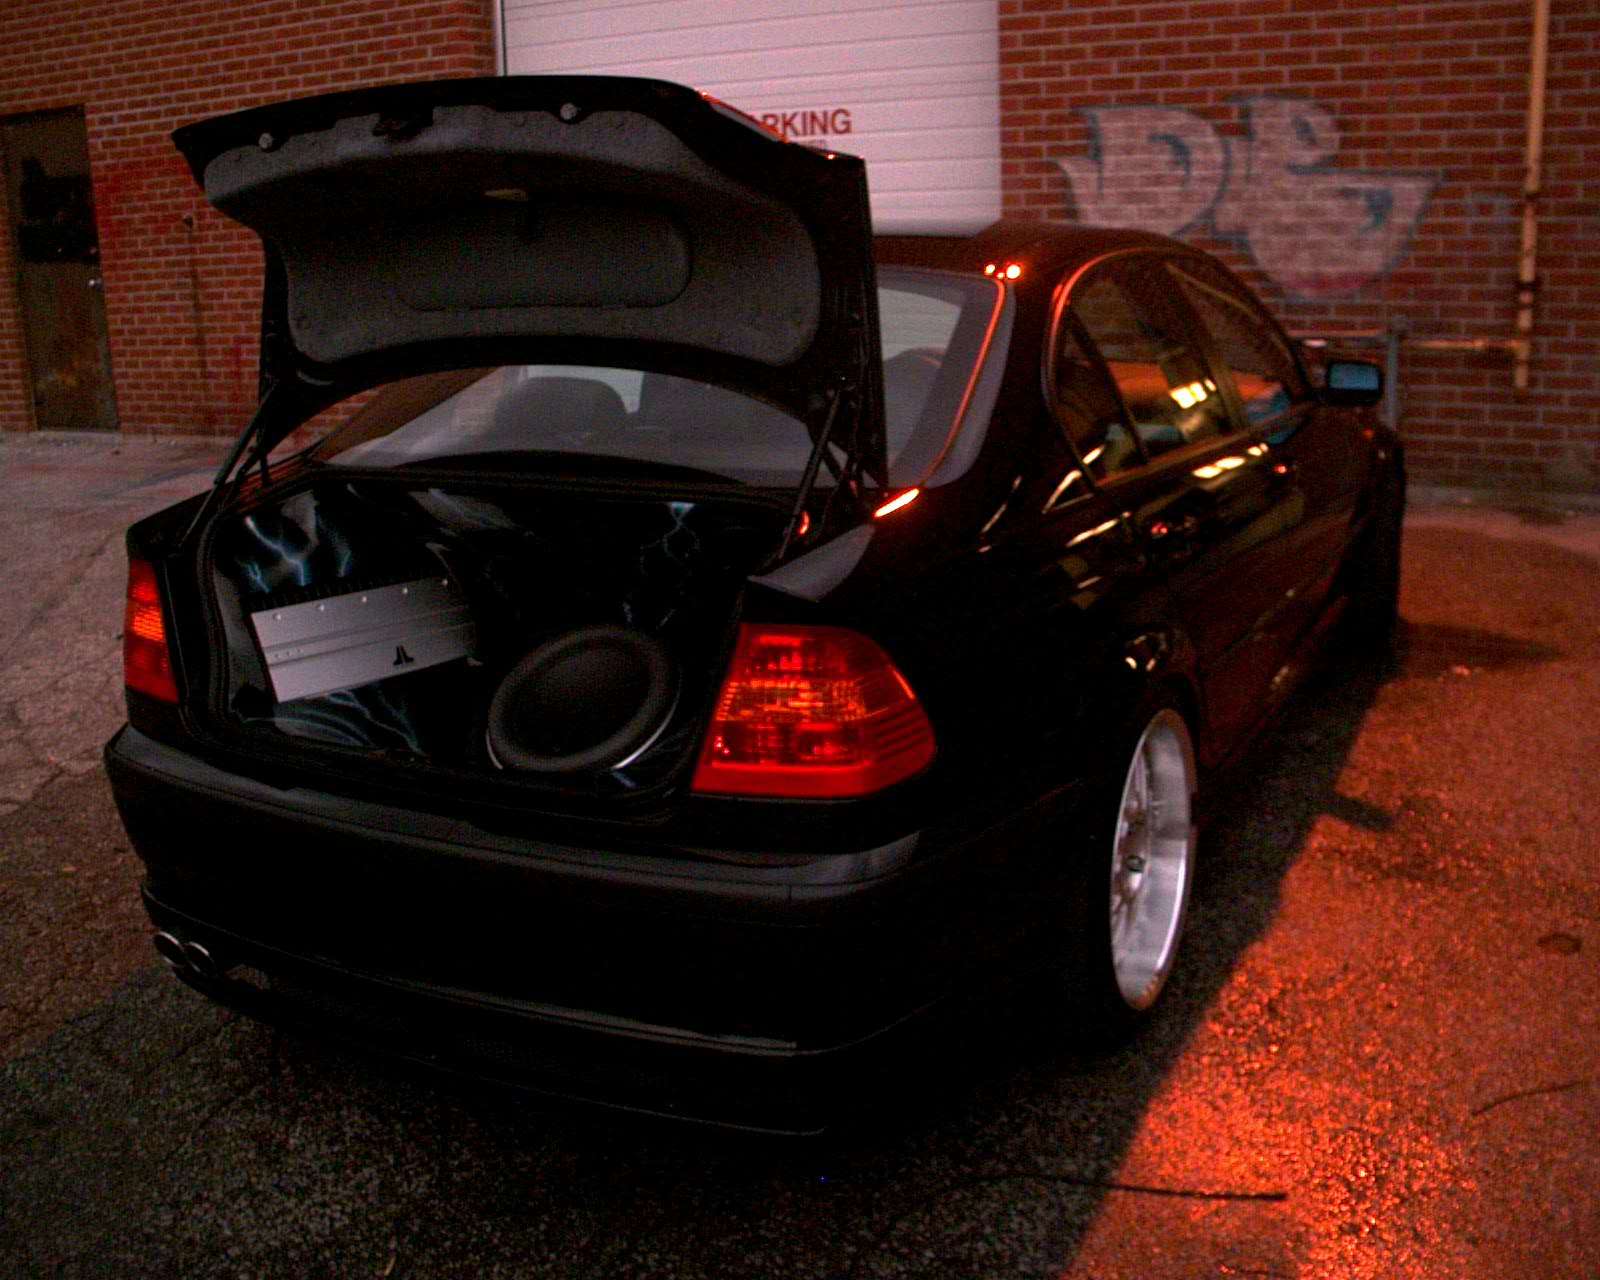 W7 Ultra Auto Sound Jl Audio Wiring Diagram 12w7 13w7 Sub Woofer Slash Amplifiers Custom Fiberglass Trunk Setup Vented Enclosure For Maximum Spl Airbrushed To Perfection